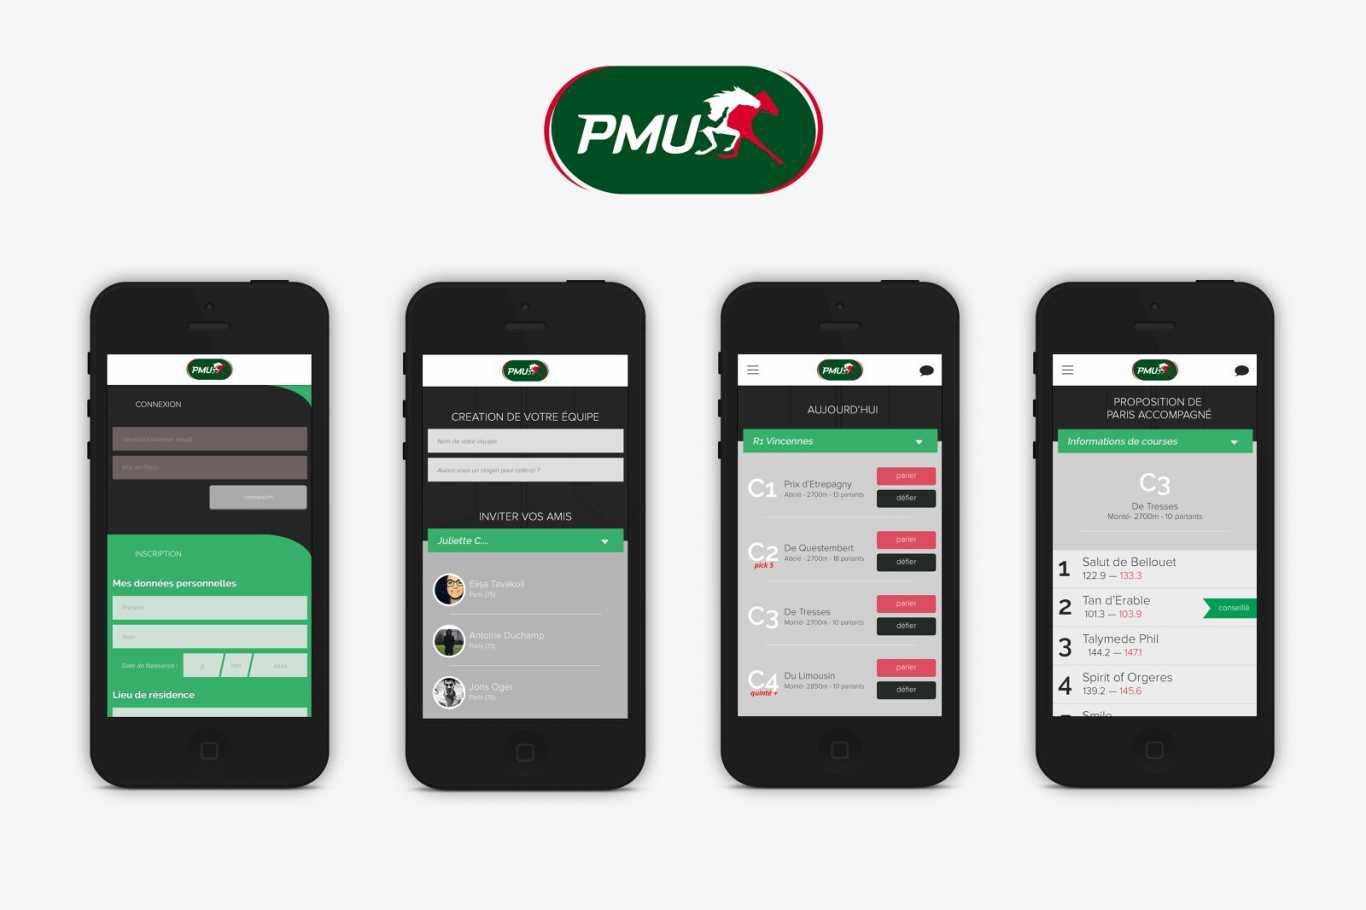 PMU mobile sénégal